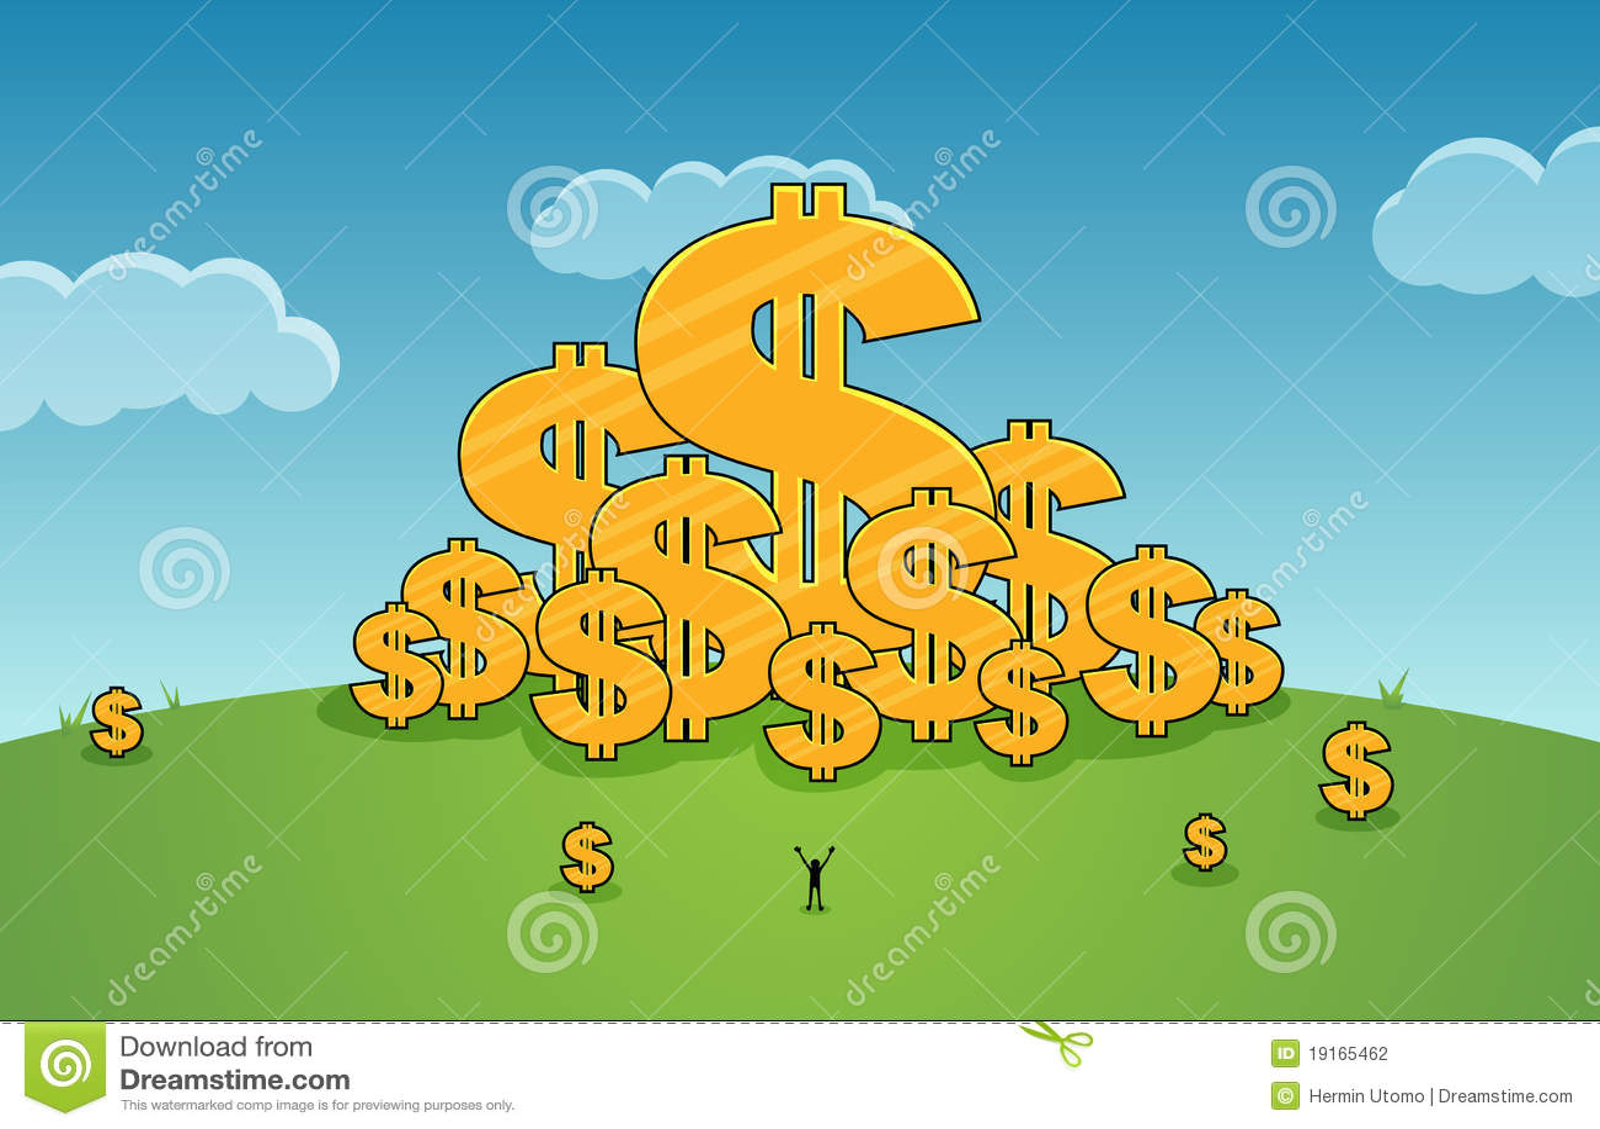 The World Ventures Compensation Plan